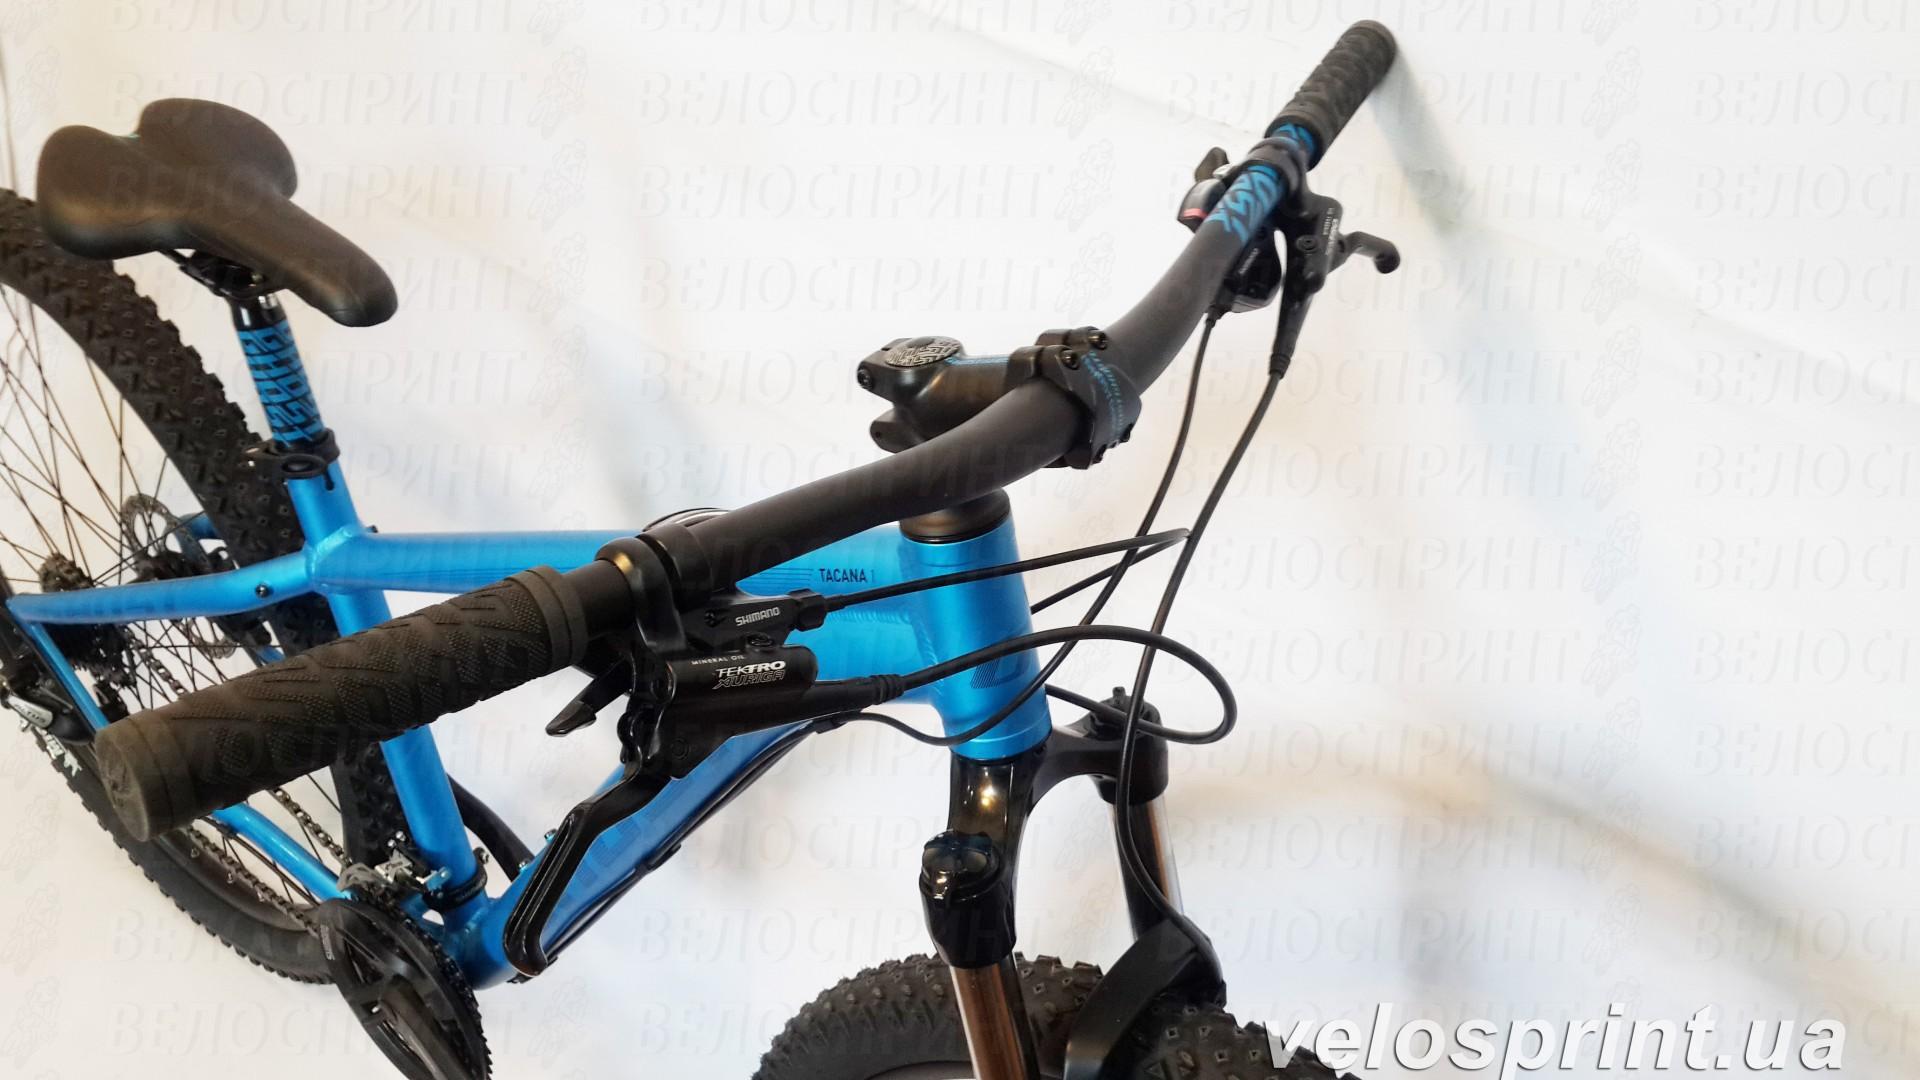 Велосипед GHOST Tacana 1 blue/darkblue/black руль год 2016